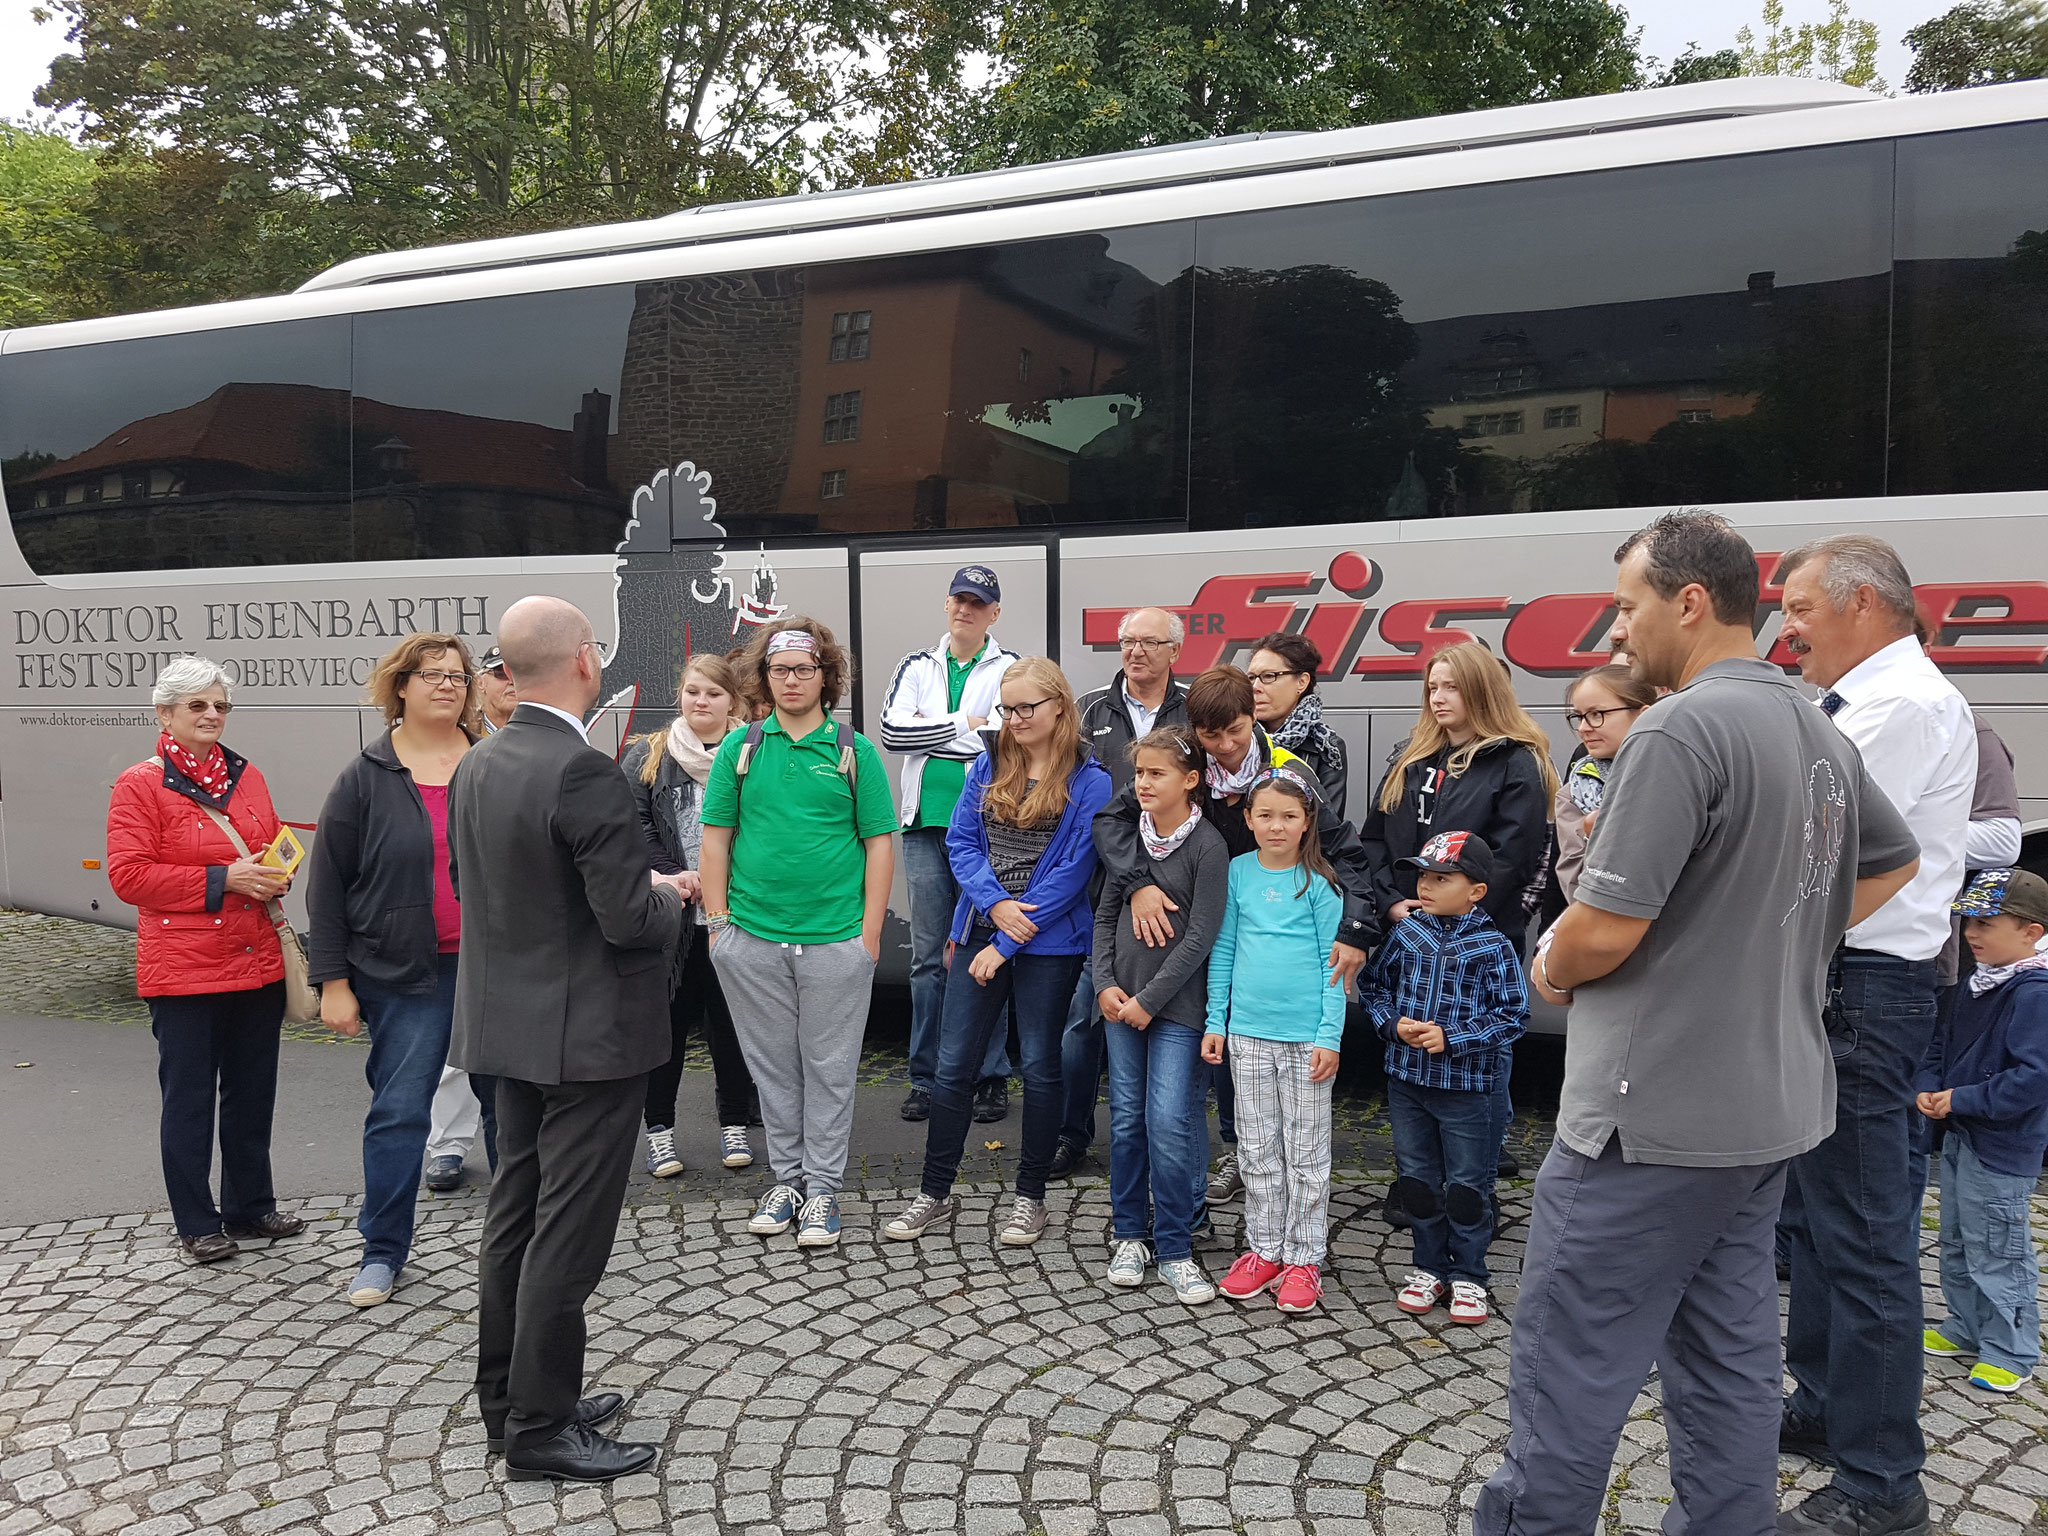 Verabschiedung durch Bürgermeister Harald Wegener